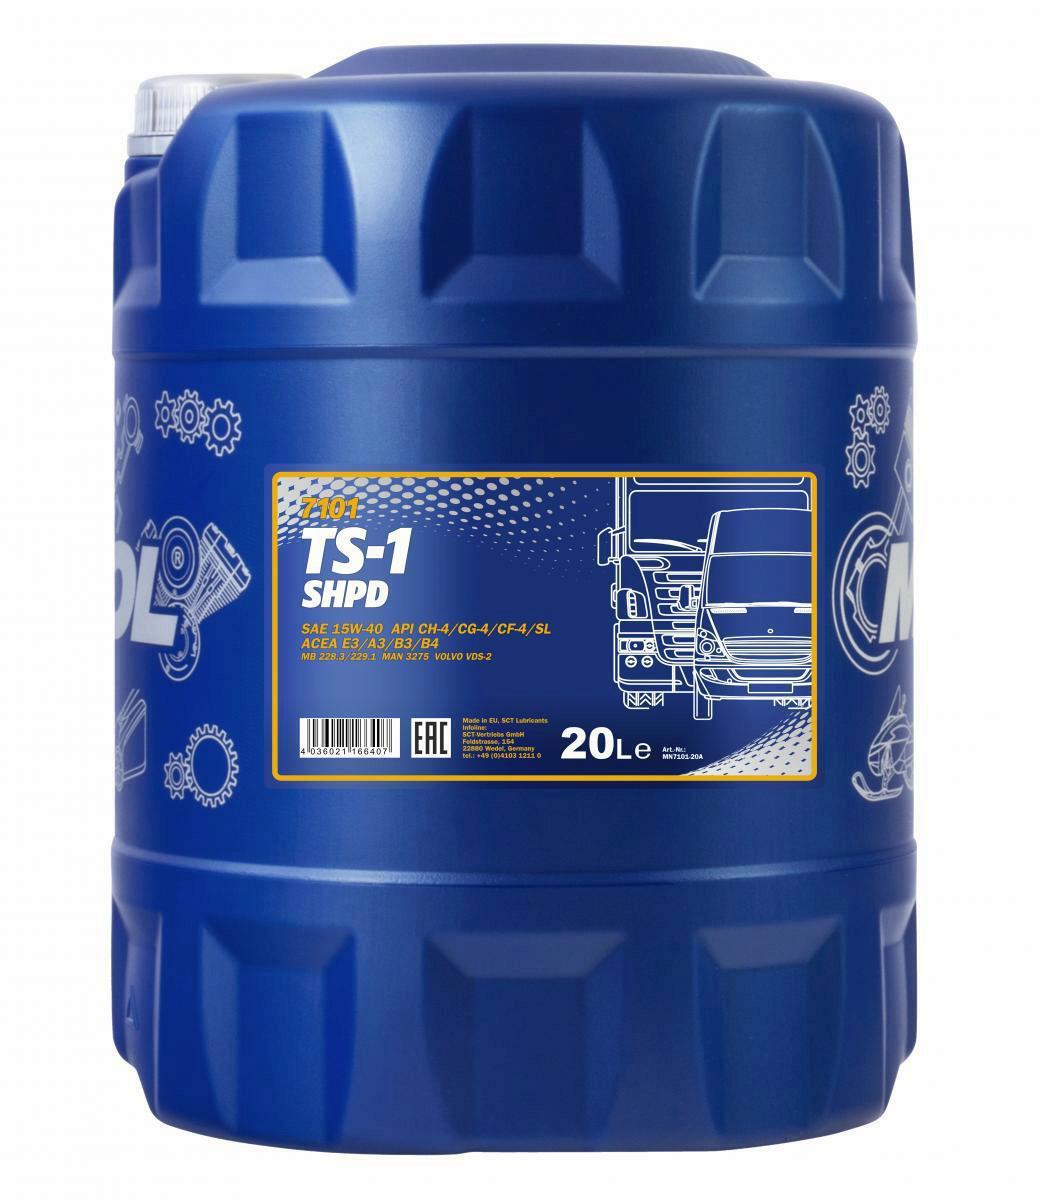 Mannol Motoröl TS-1 SHPD 20L